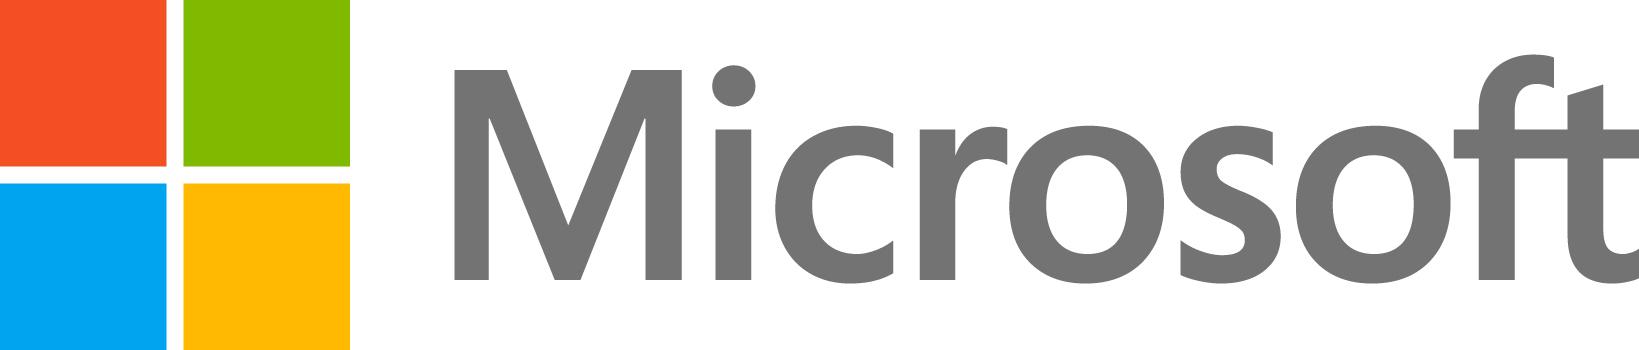 Nieuwe Microsoft logo